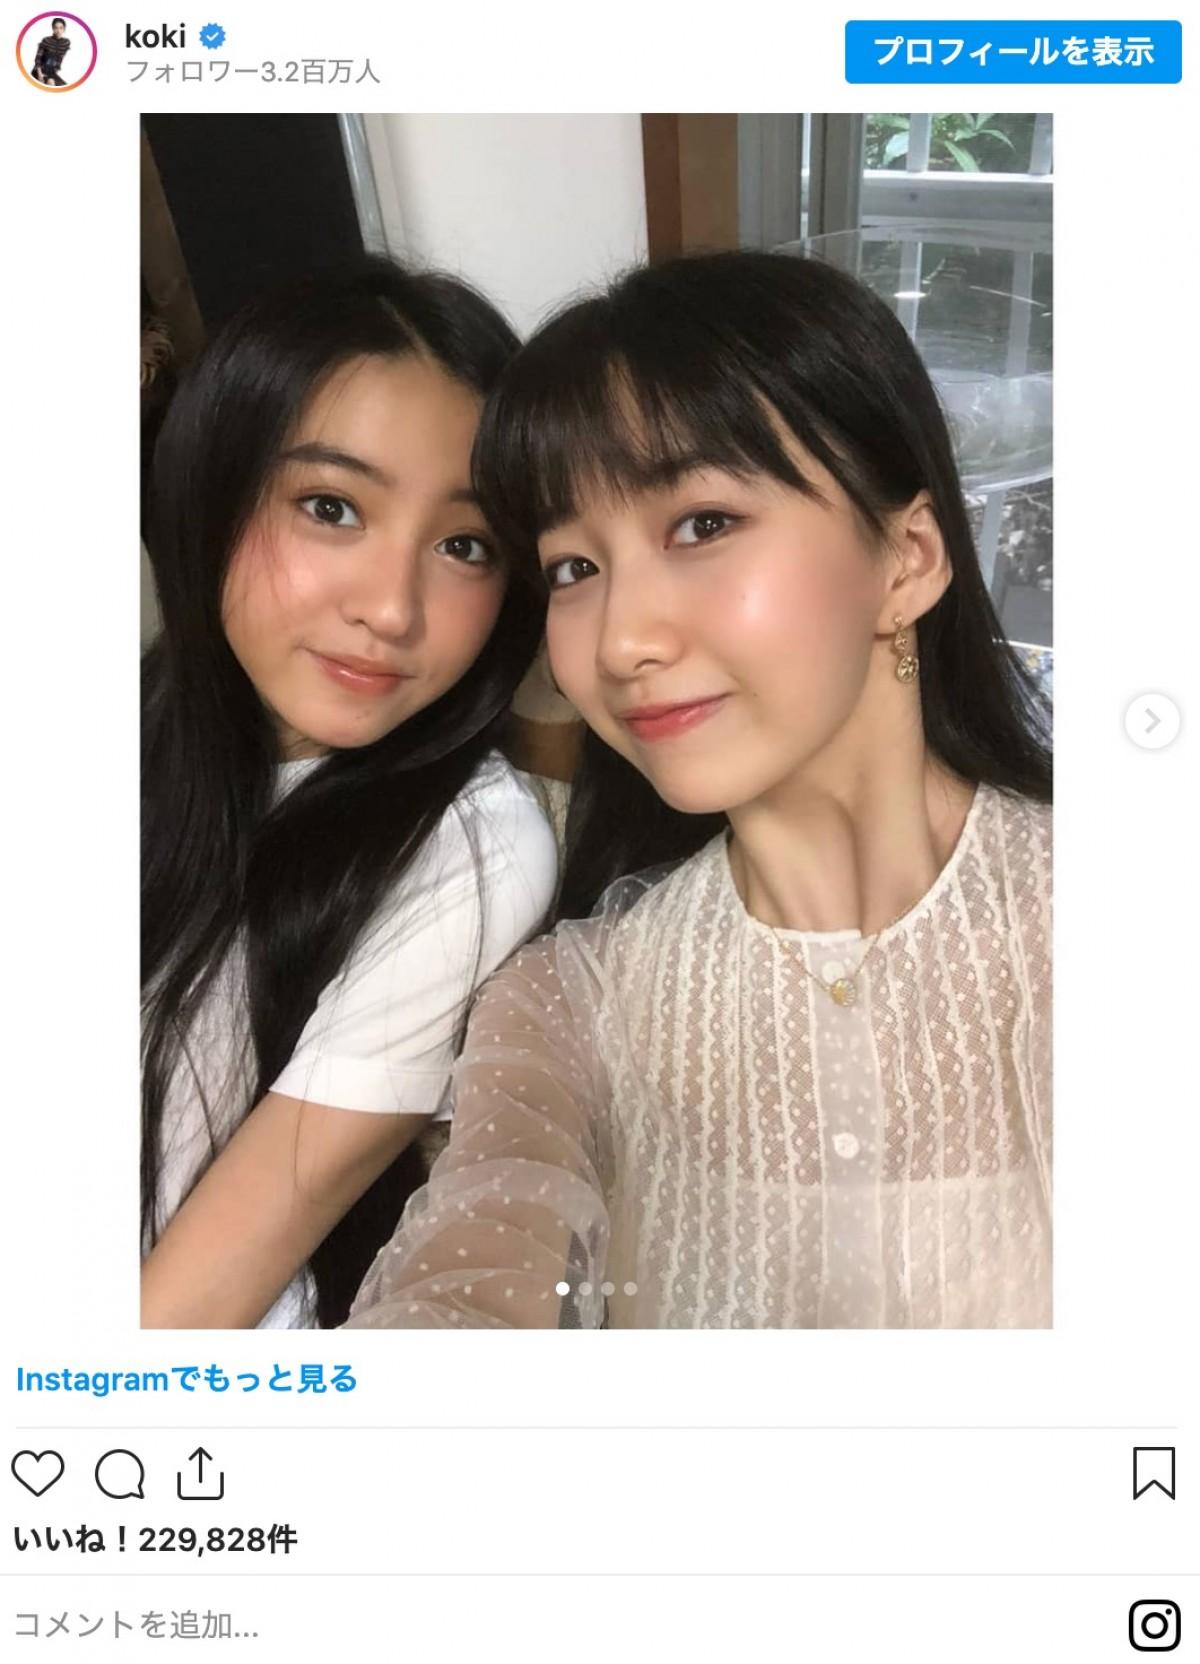 Koki,Cocomi姉妹、キュートなキス顔&変顔ショットを披露 /2020年9月21日 1ページ目 - エンタメ - ニュース - クランクイン!